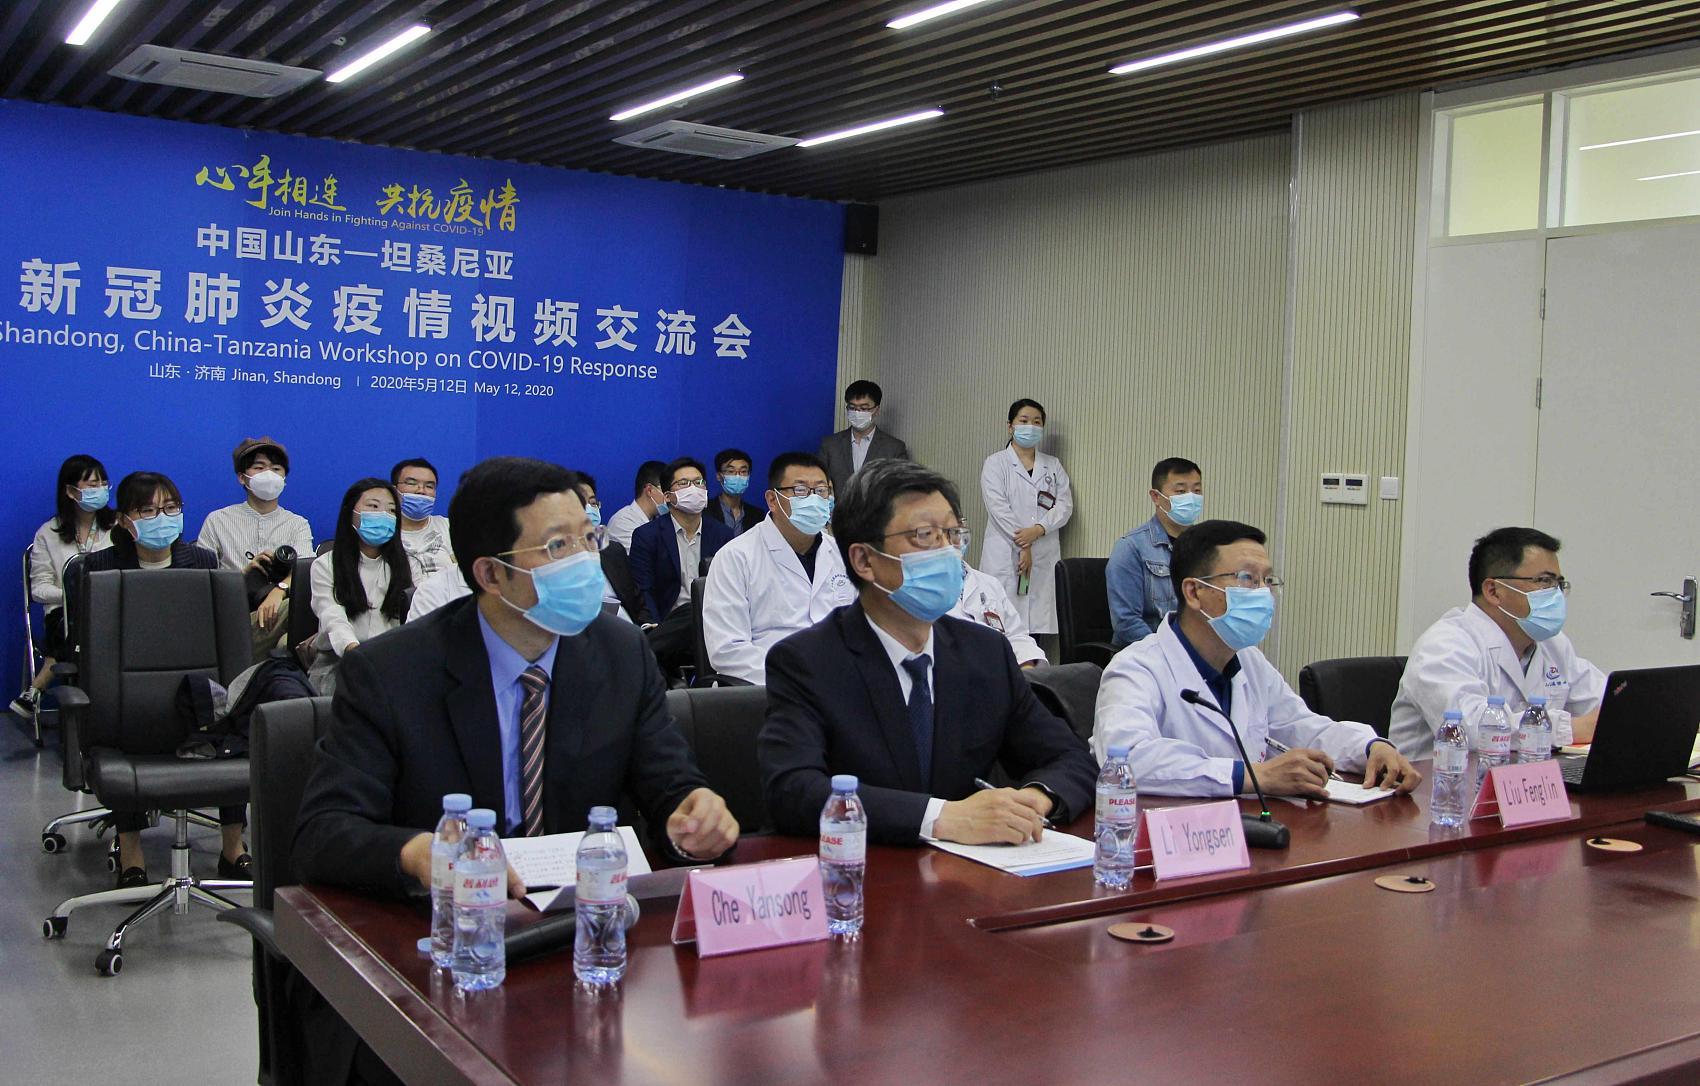 Solidarity in fighting coronavirus brings China, Africa closer